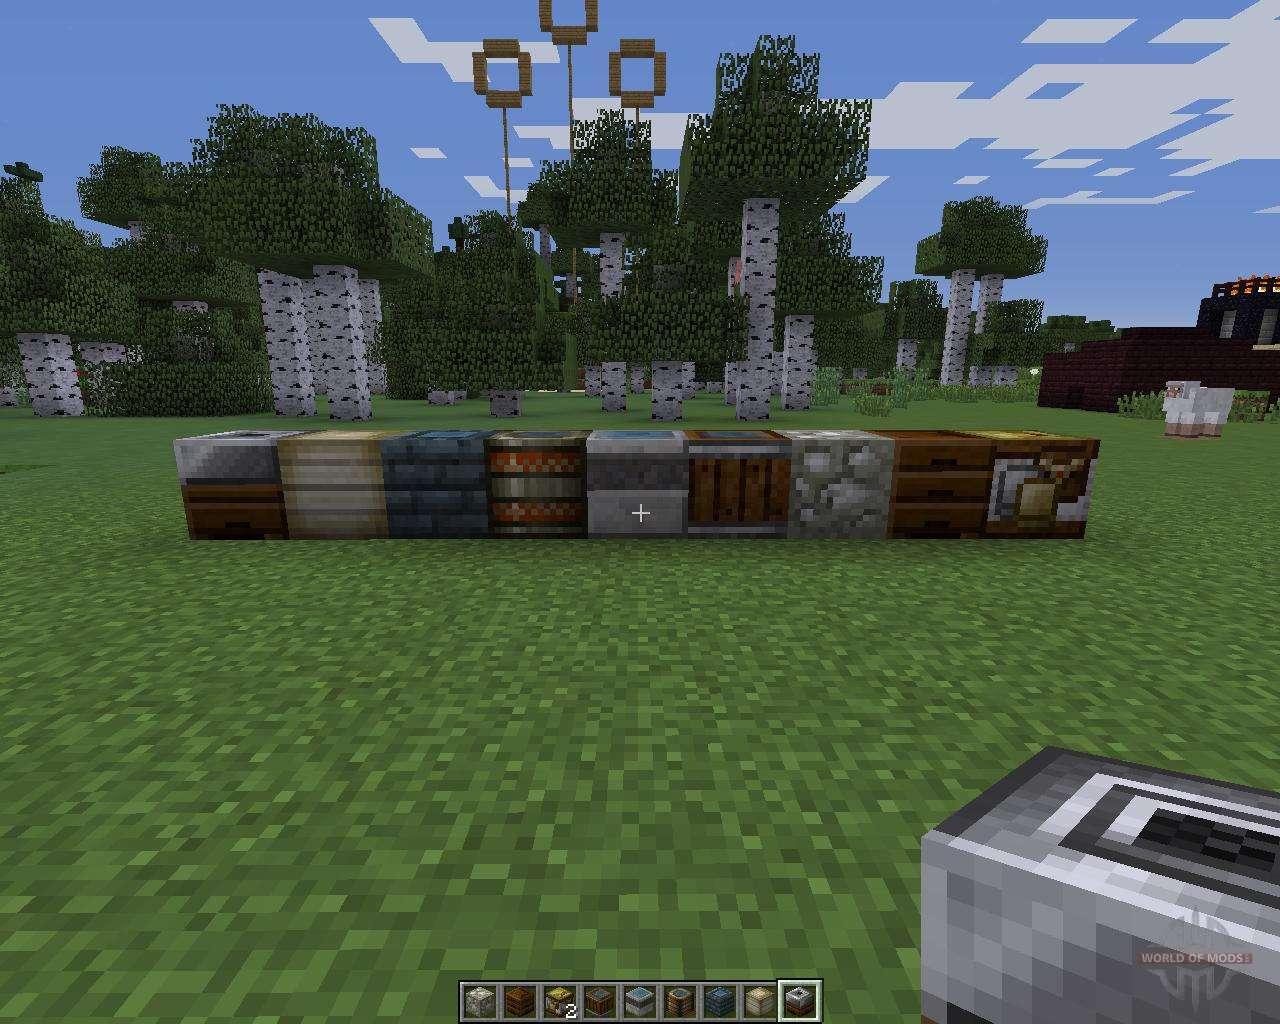 мод harvestcraft для майнкрафт 1.7.10